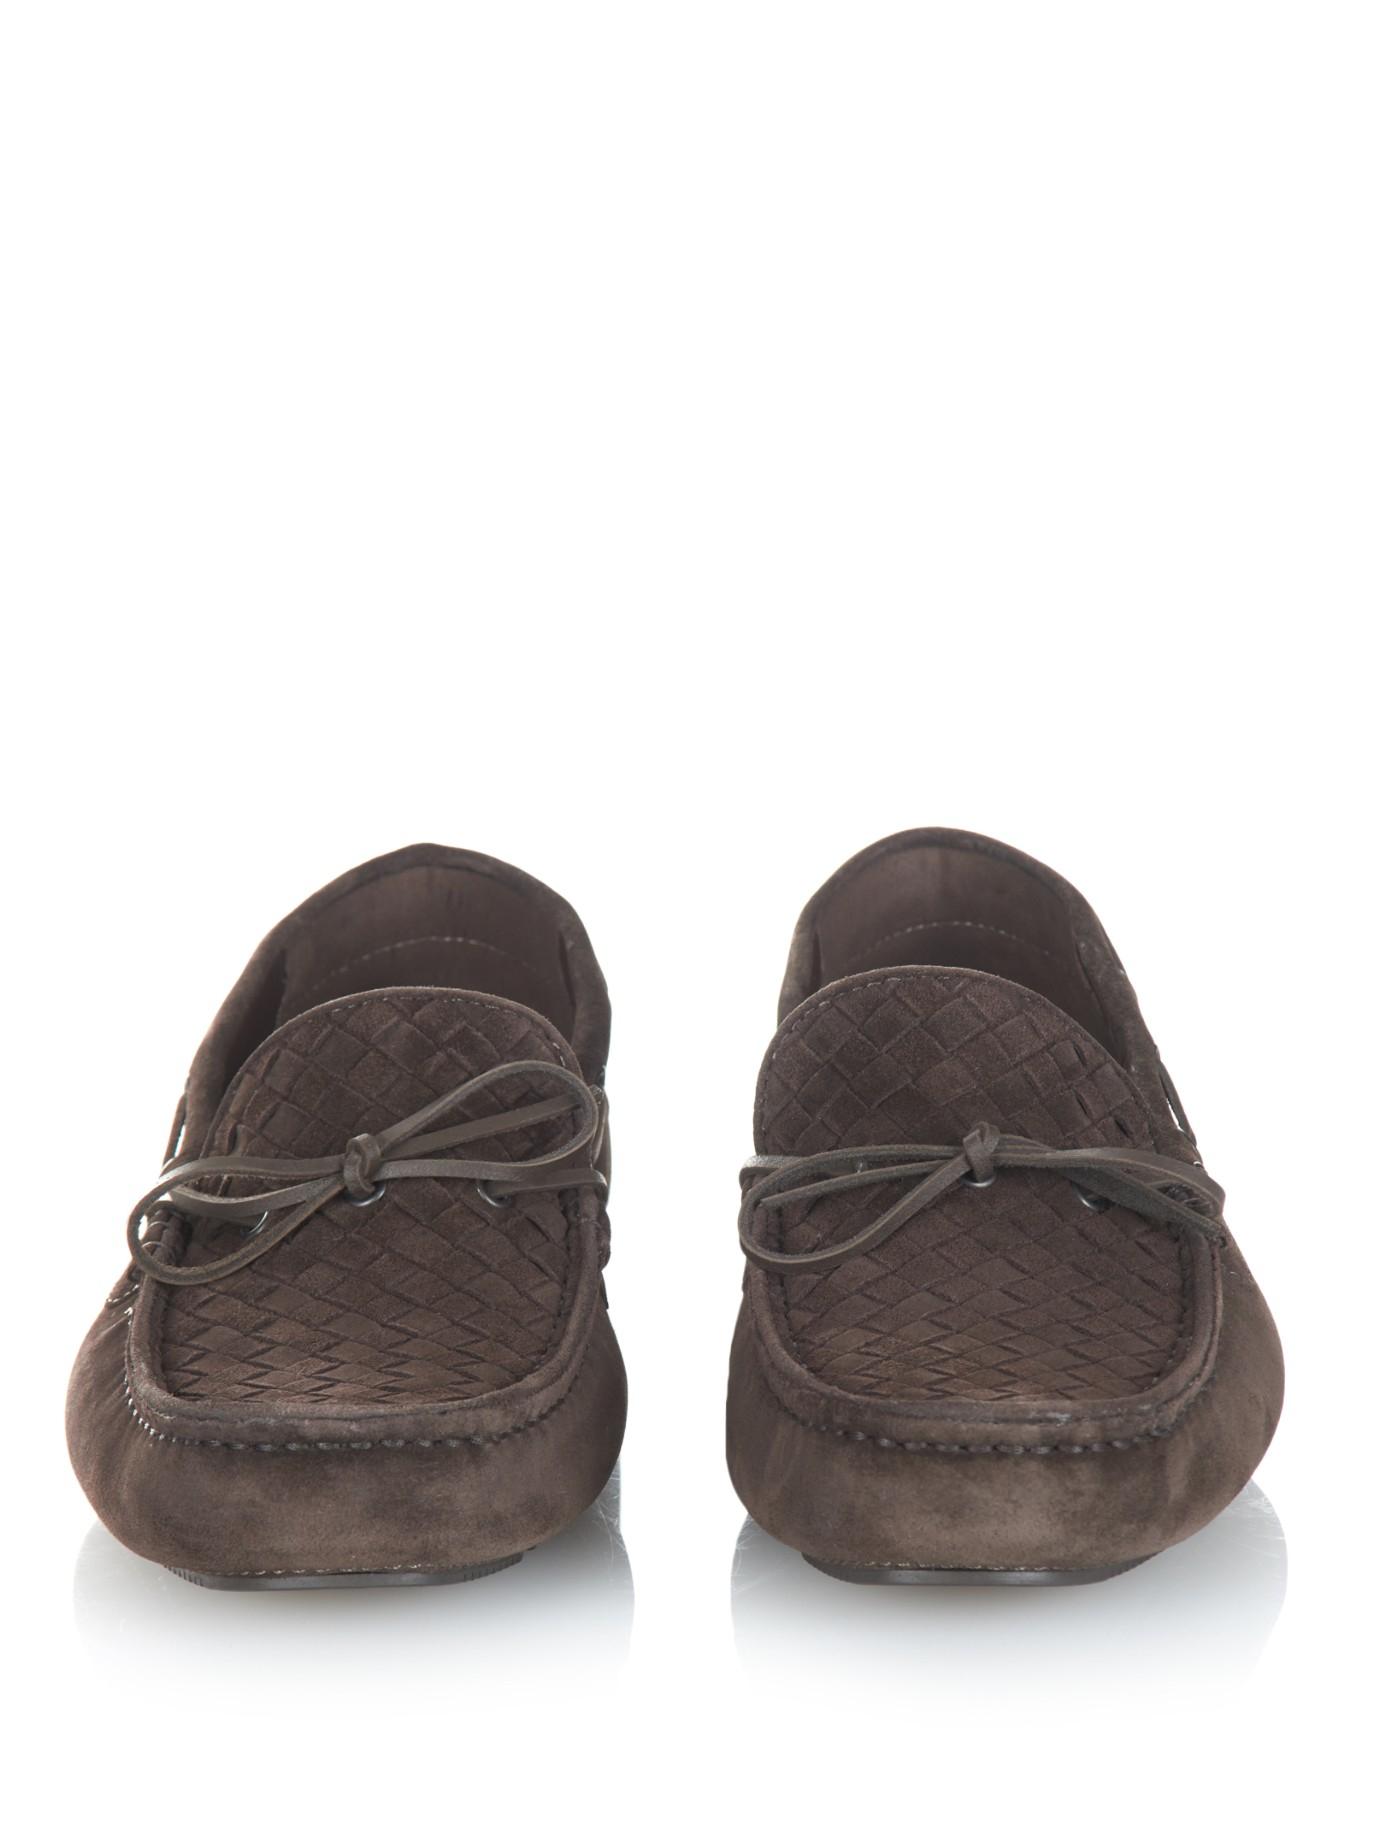 classic Intrecciato loafers - Brown Bottega Veneta PrRtigD